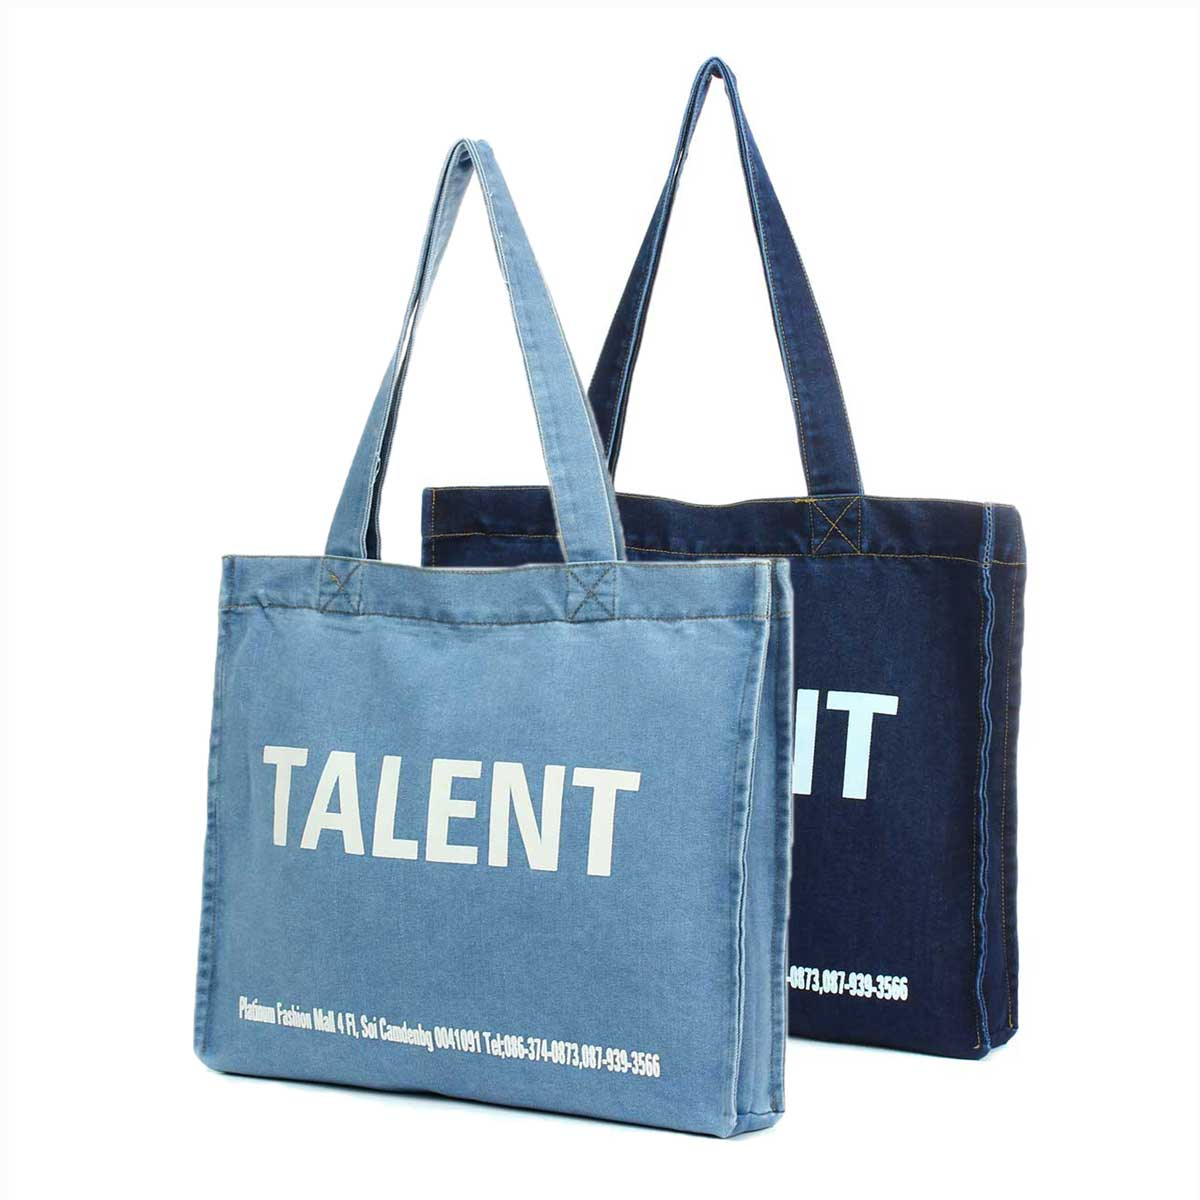 High Quality Women Denim Canvas Bags Shopping Eco Reusable Foldable Shoulder Bag Handbag Tote Bag Casual Travel Folding Bag Blue